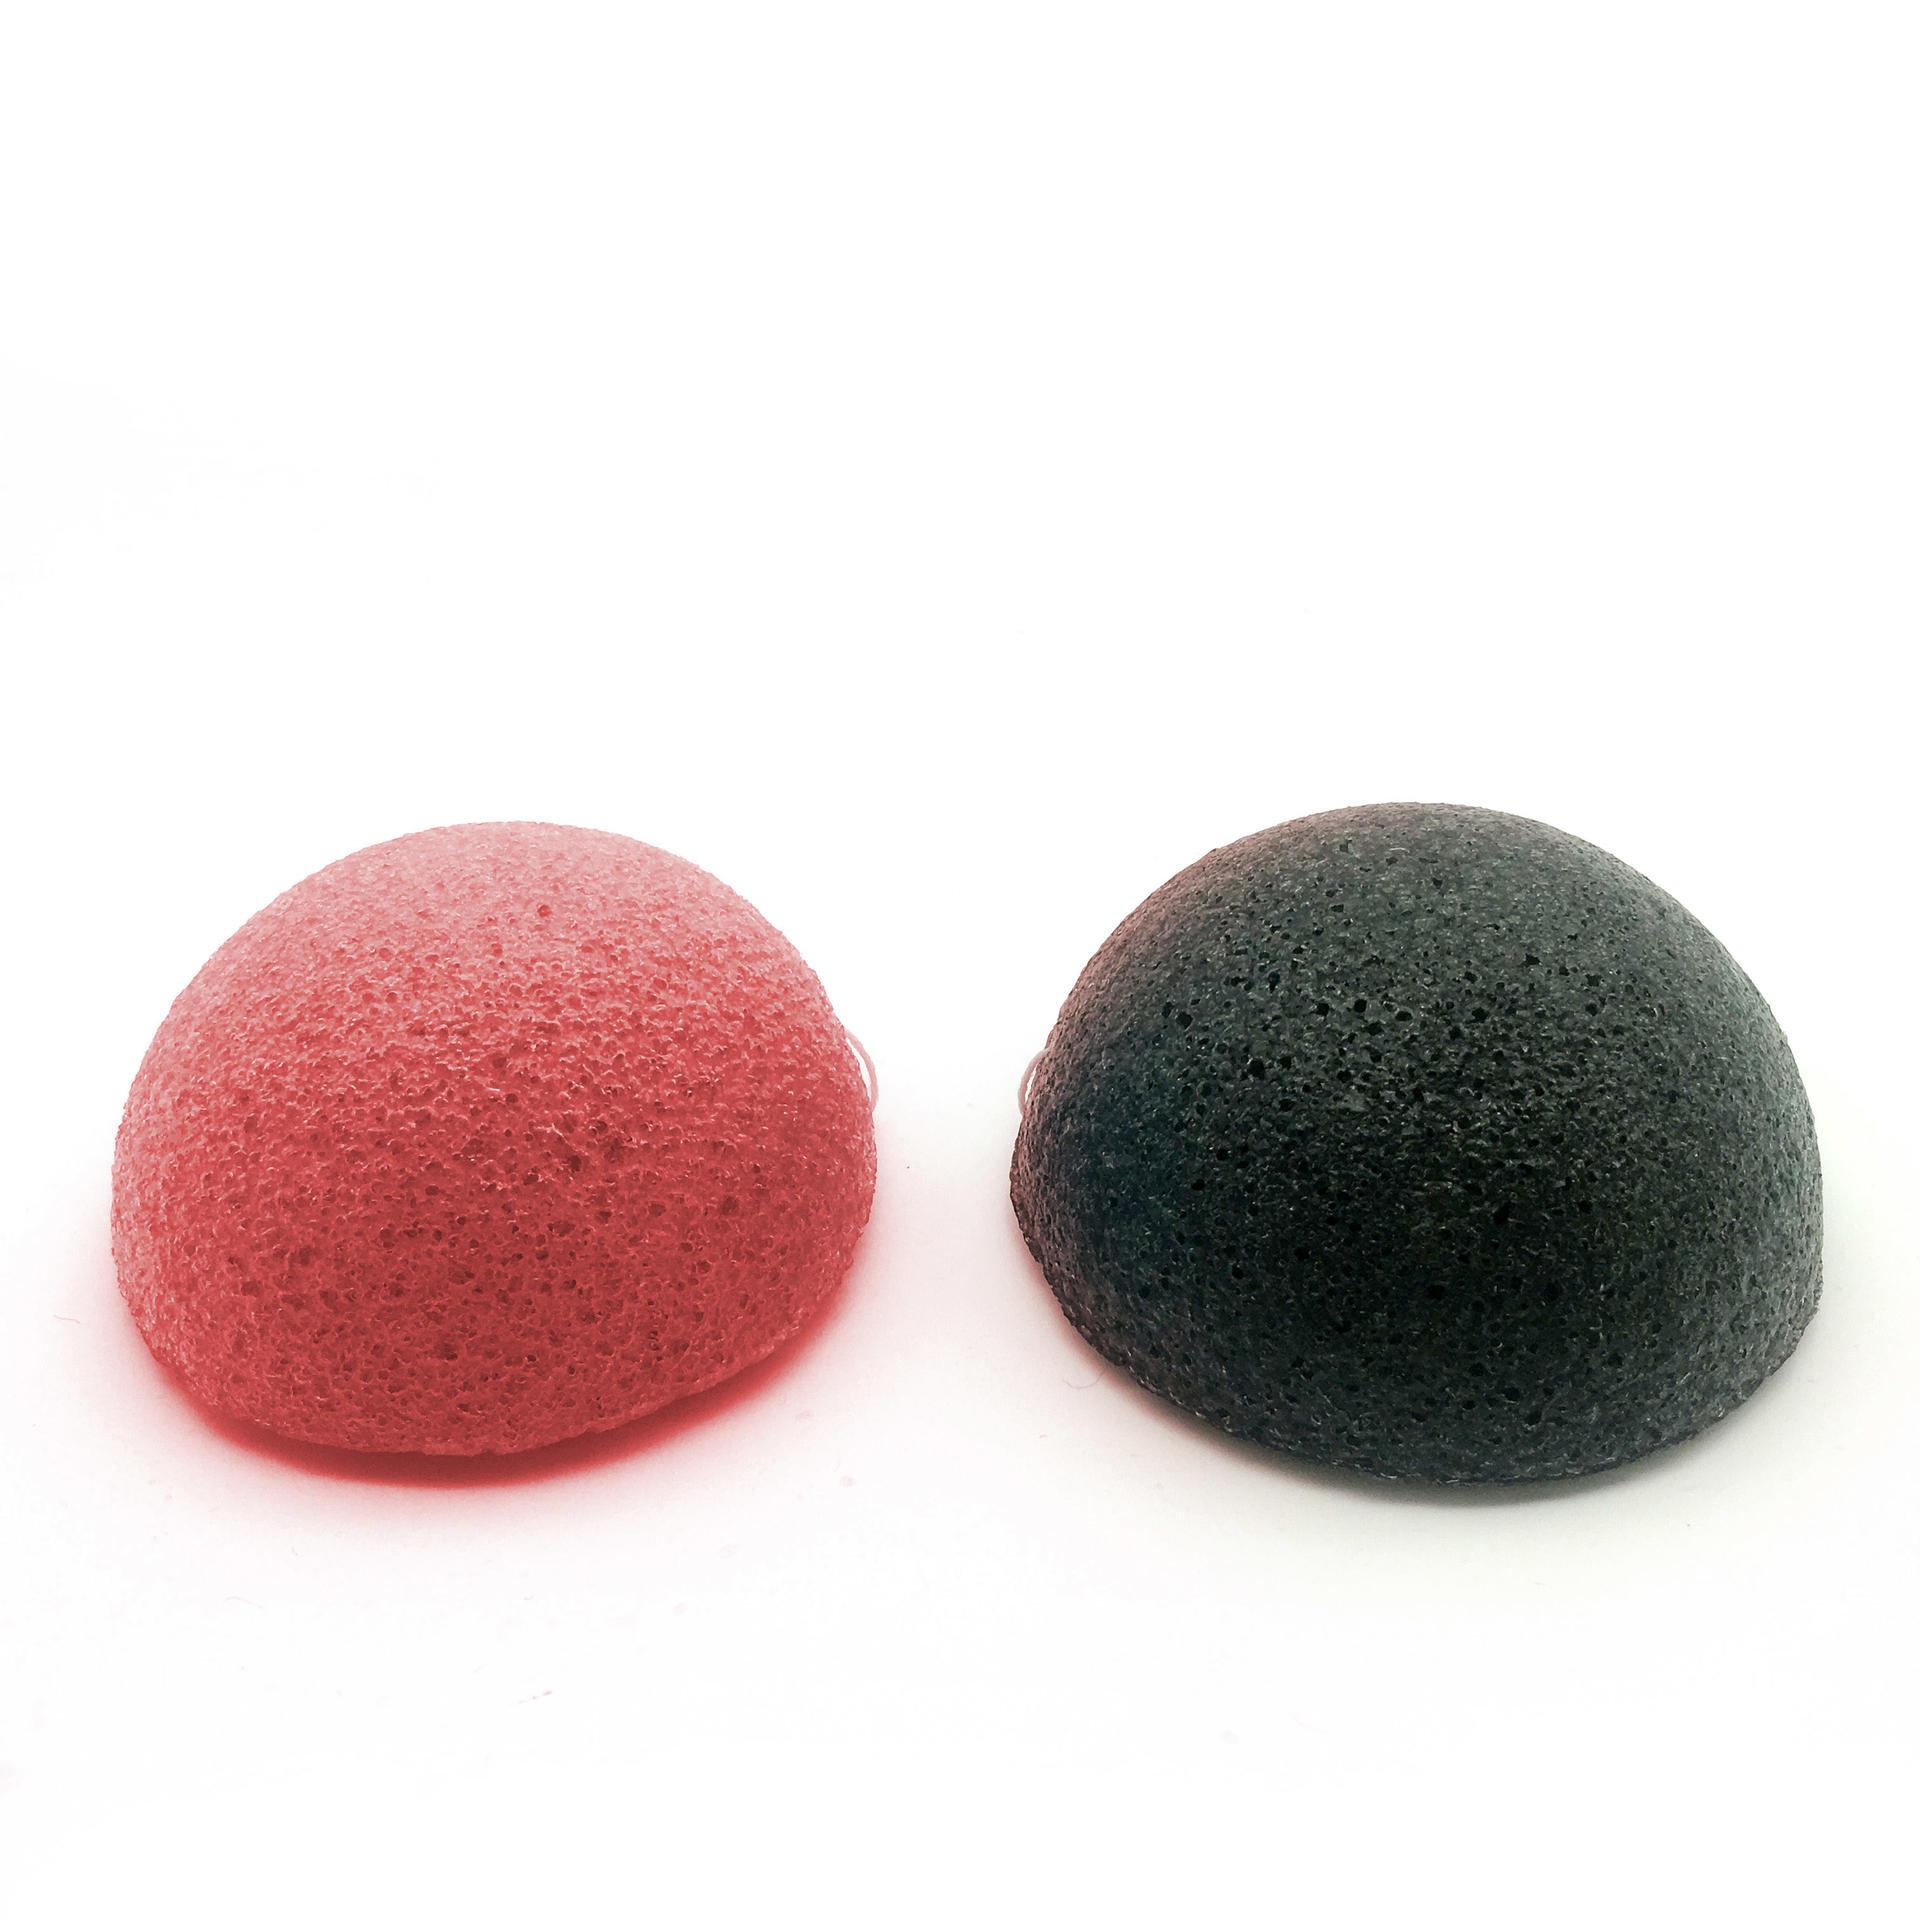 wholesale 100 % Sponge facial puff pink french clay konjac sponge